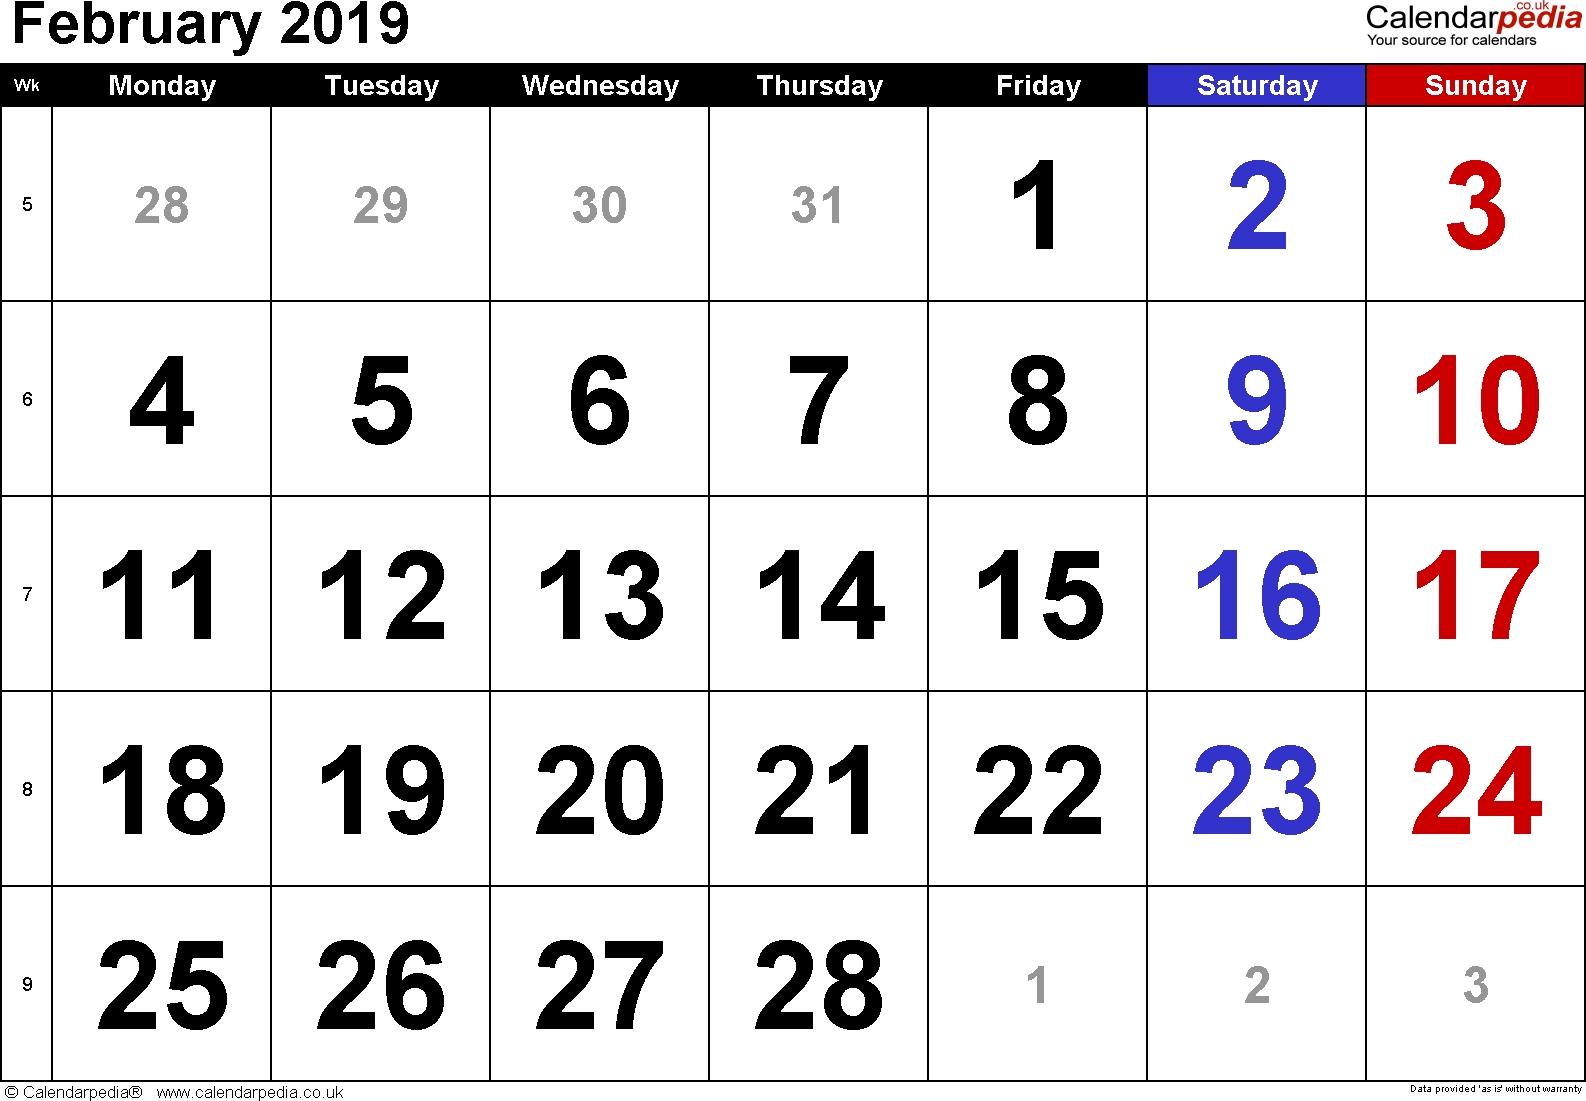 Calendar February 2019 Uk, Bank Holidays, Excel/pdf/word Templates Feb 5 2019 Calendar